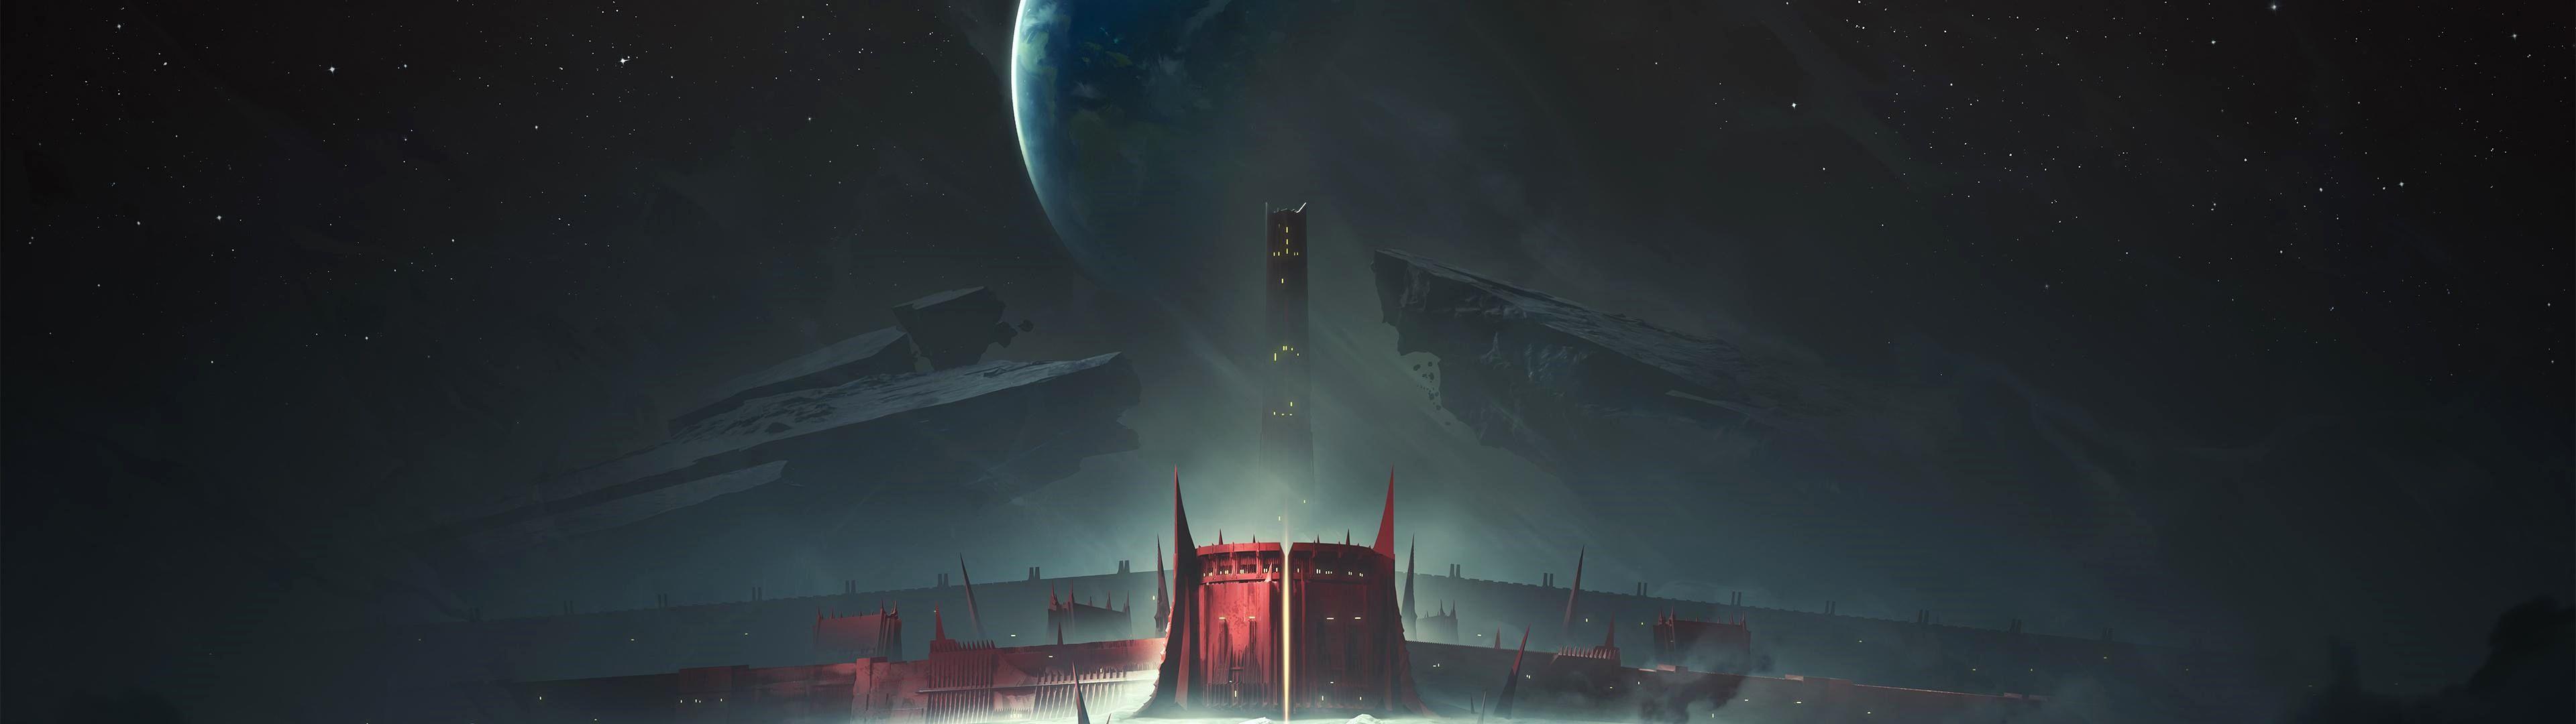 Destiny 2 4k Wallpaper Reddit Gallery Em 2020